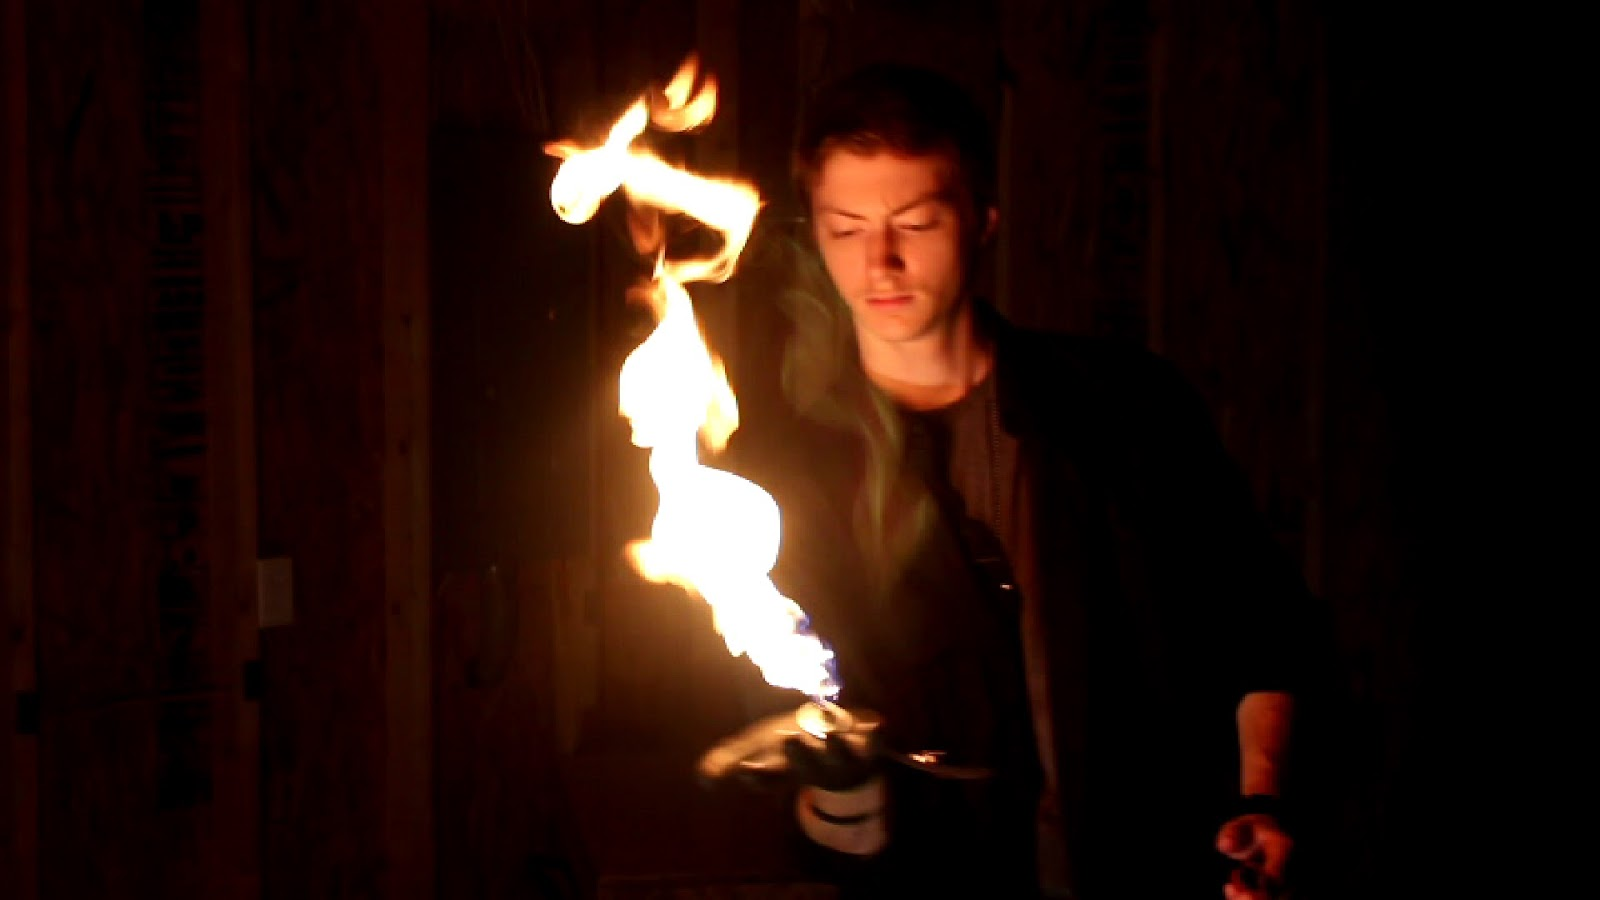 Jake Makes: Butane Wrist Mounted Flamethrower